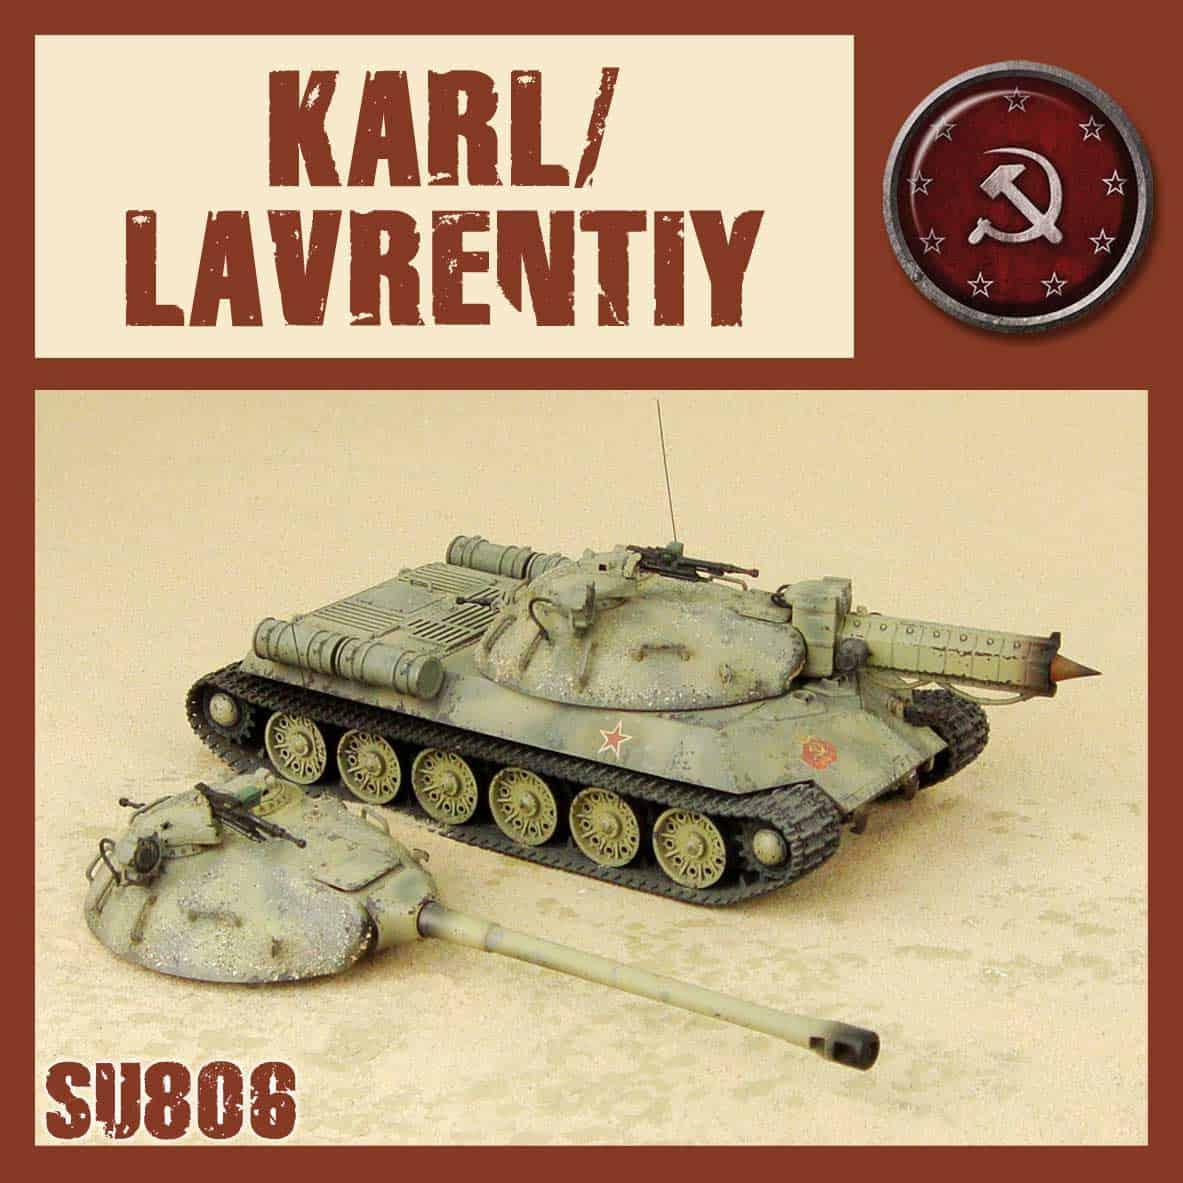 Lavrentiy  / Karl